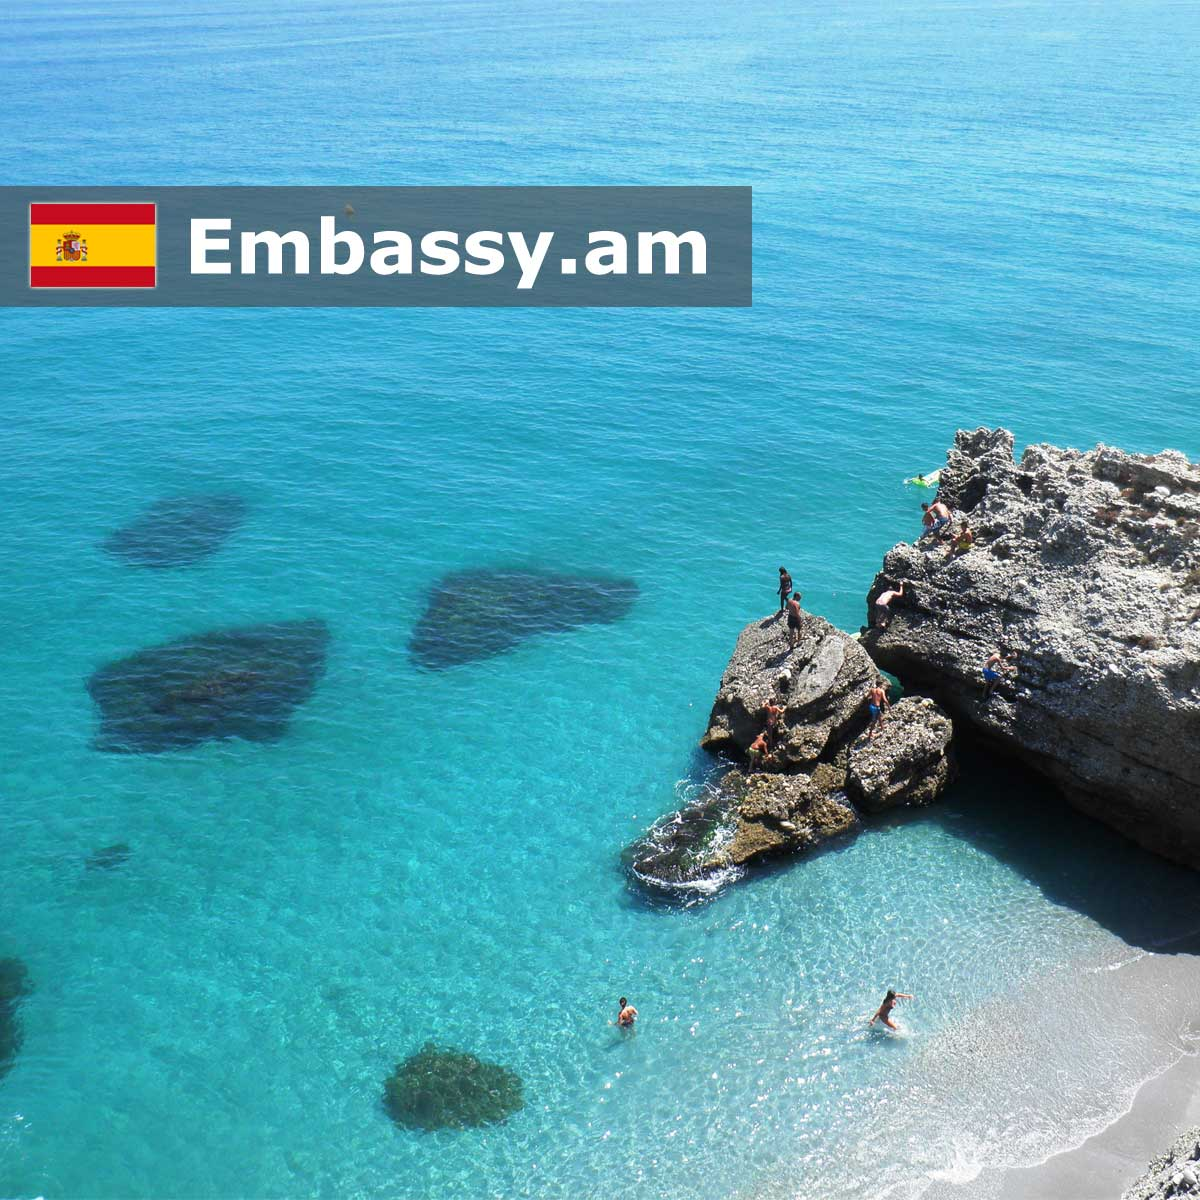 Nerja - Hotels in Spain - Embassy.am